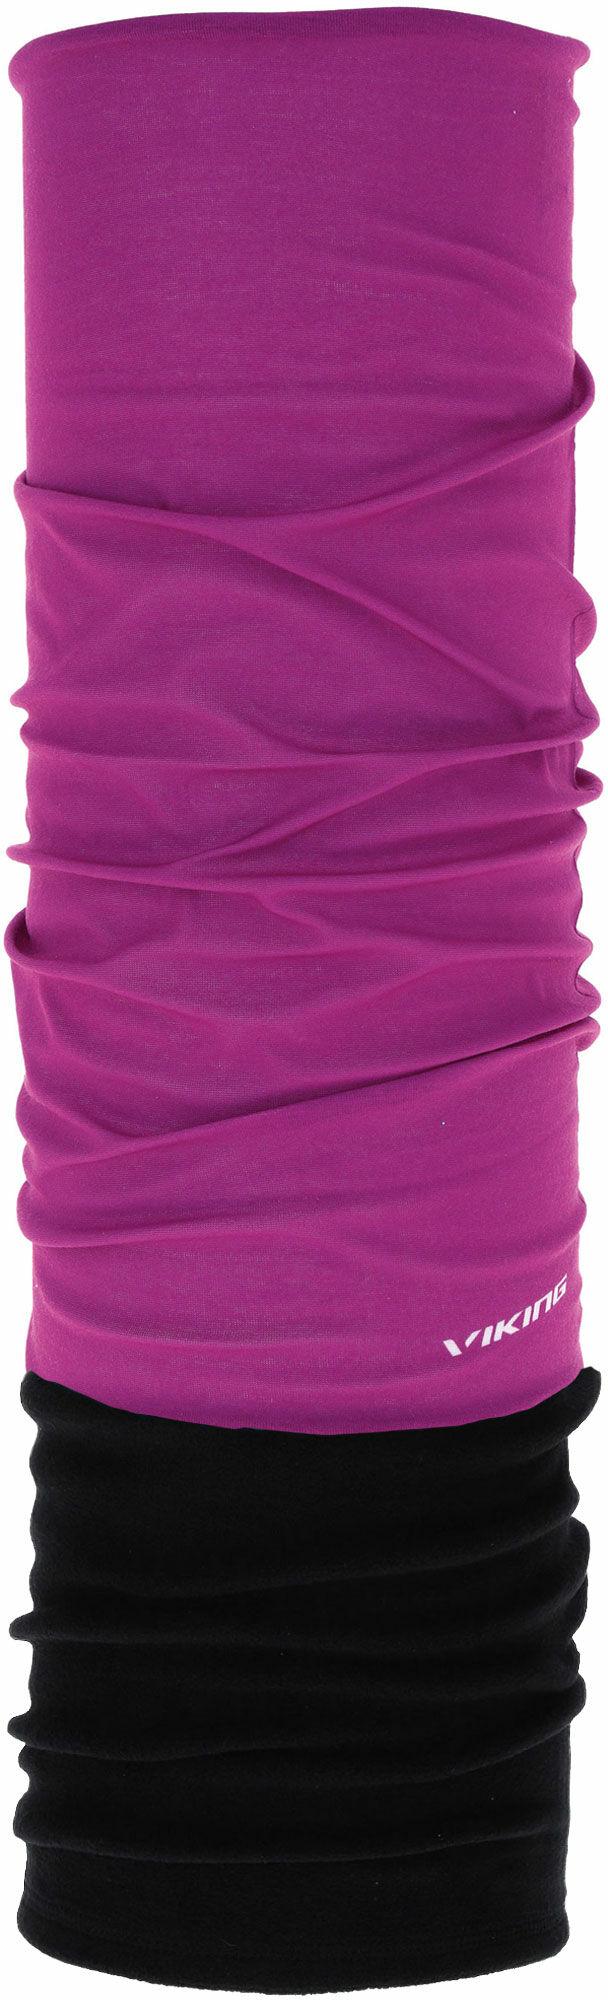 VIKING bandana wielofunkcyjna POLARTEC OUTSIDE pink 420/22/1214/46 Rozmiar: UNI,420/22/1214/46/UNI